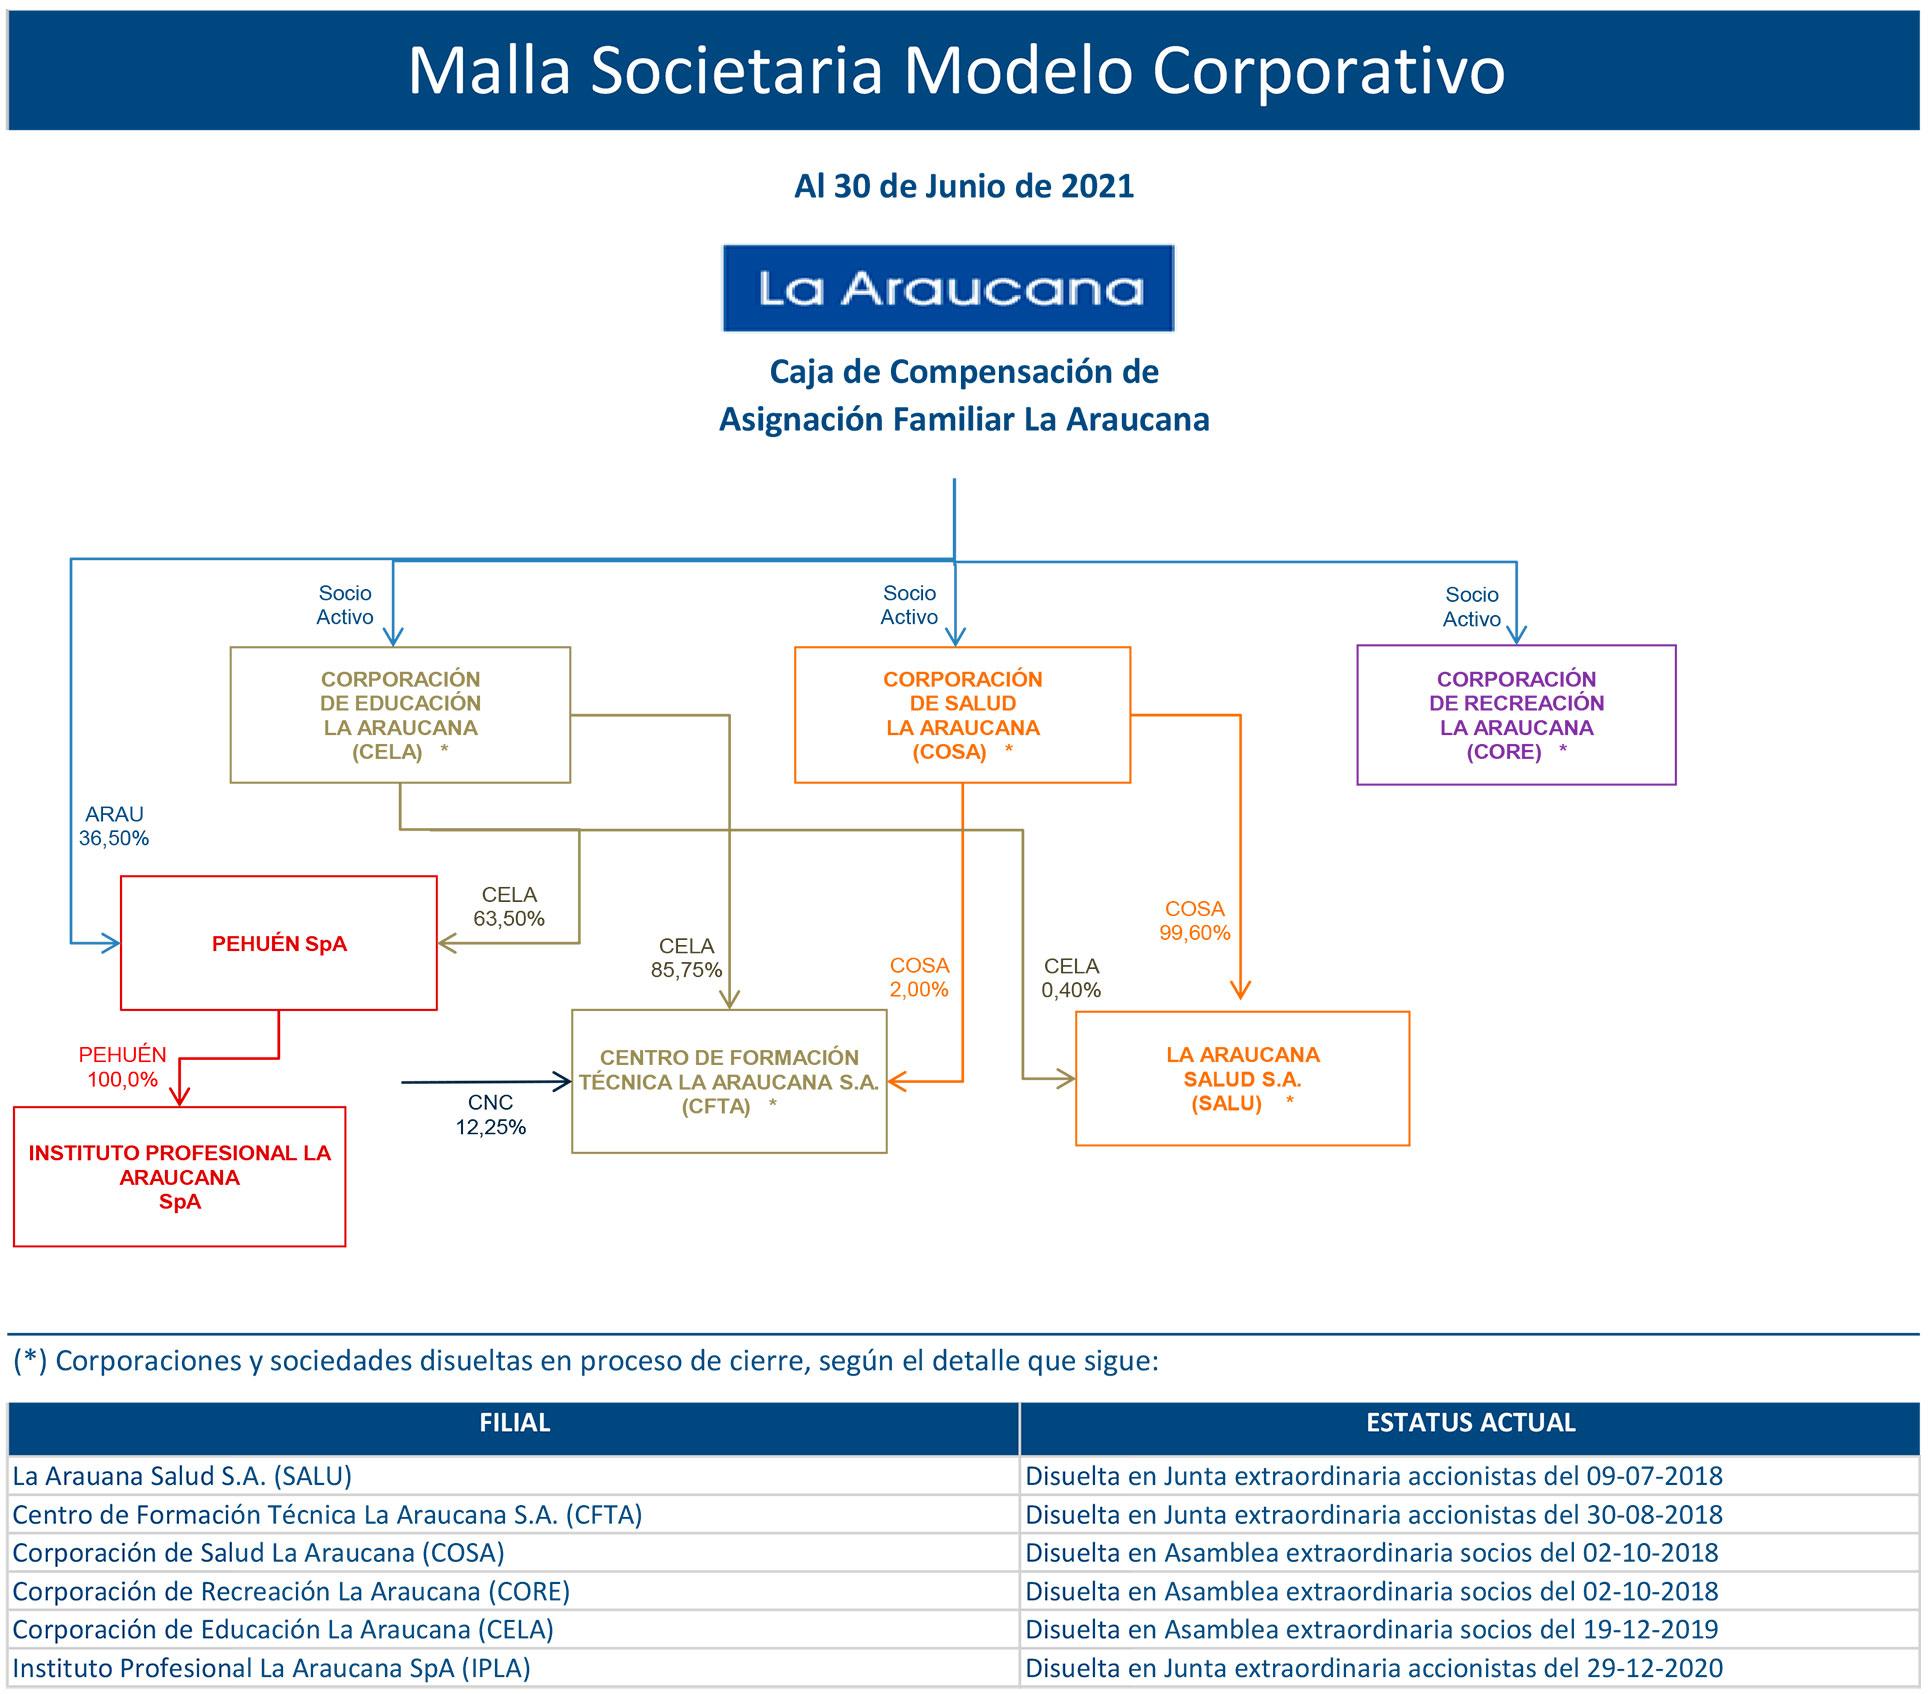 Imagen Malla Societaria Modelo Corporativo